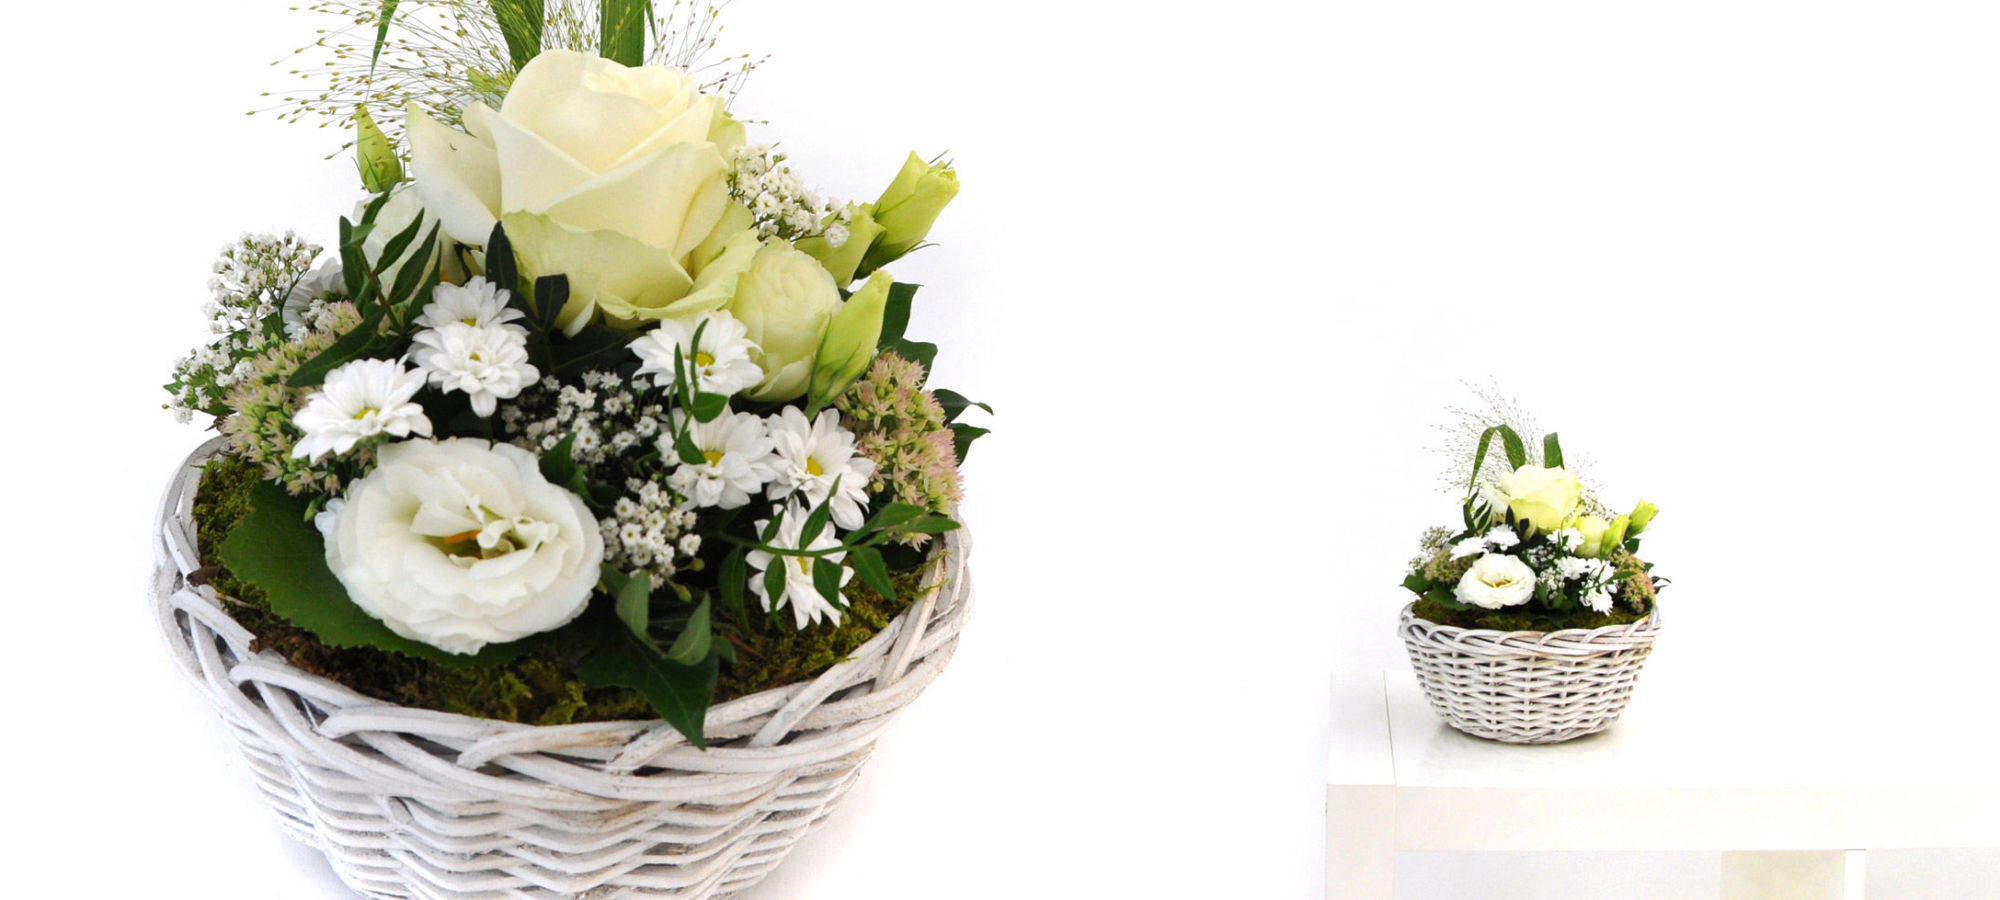 STRUB Blumengestecke